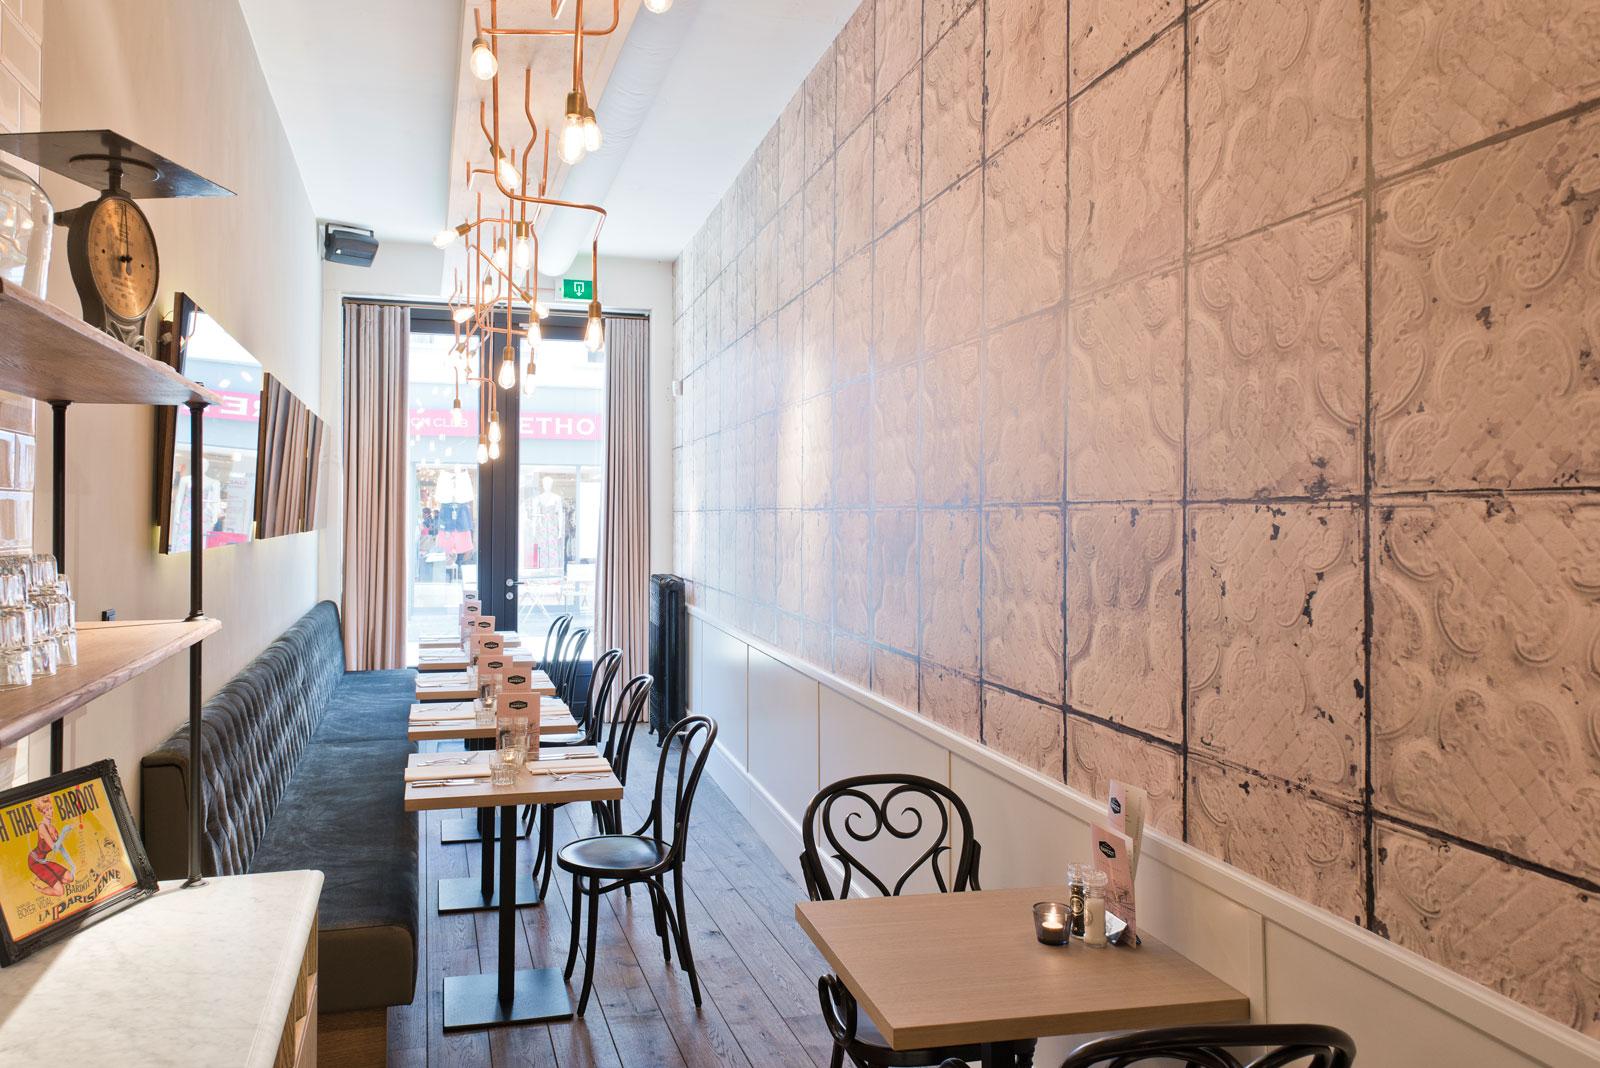 787f13d7 2a41 4cd4 b67f 3580b30fd30a dsc0075 copy Brasserie Bardot Restaurant